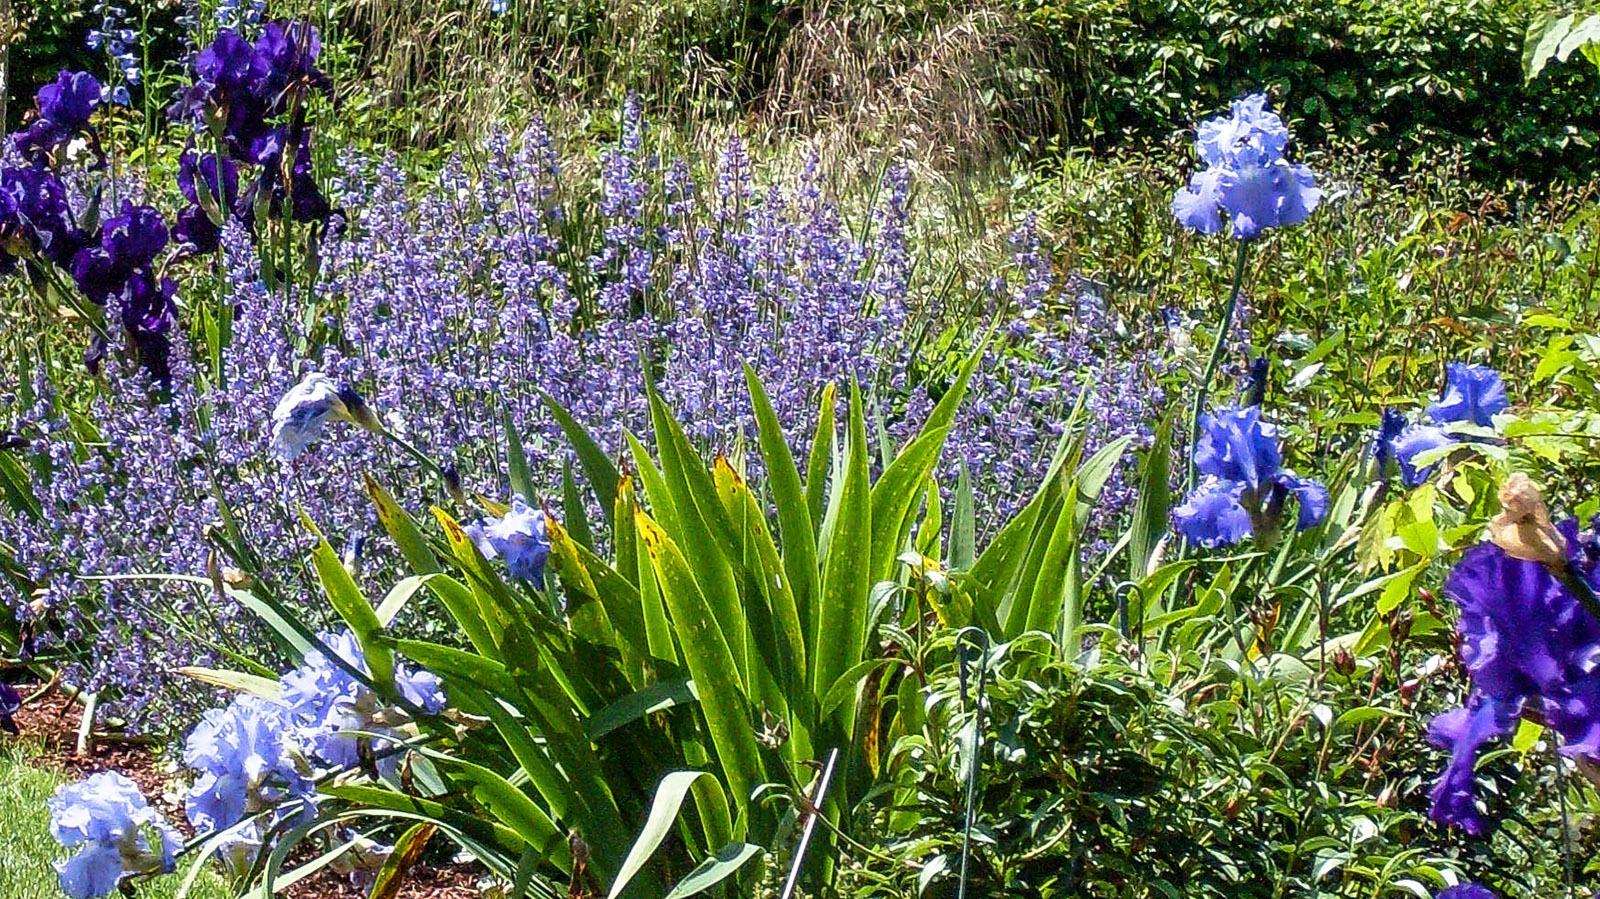 Château de Villandry: Blütenrausch in Blau. Foto: Hilke Maunder